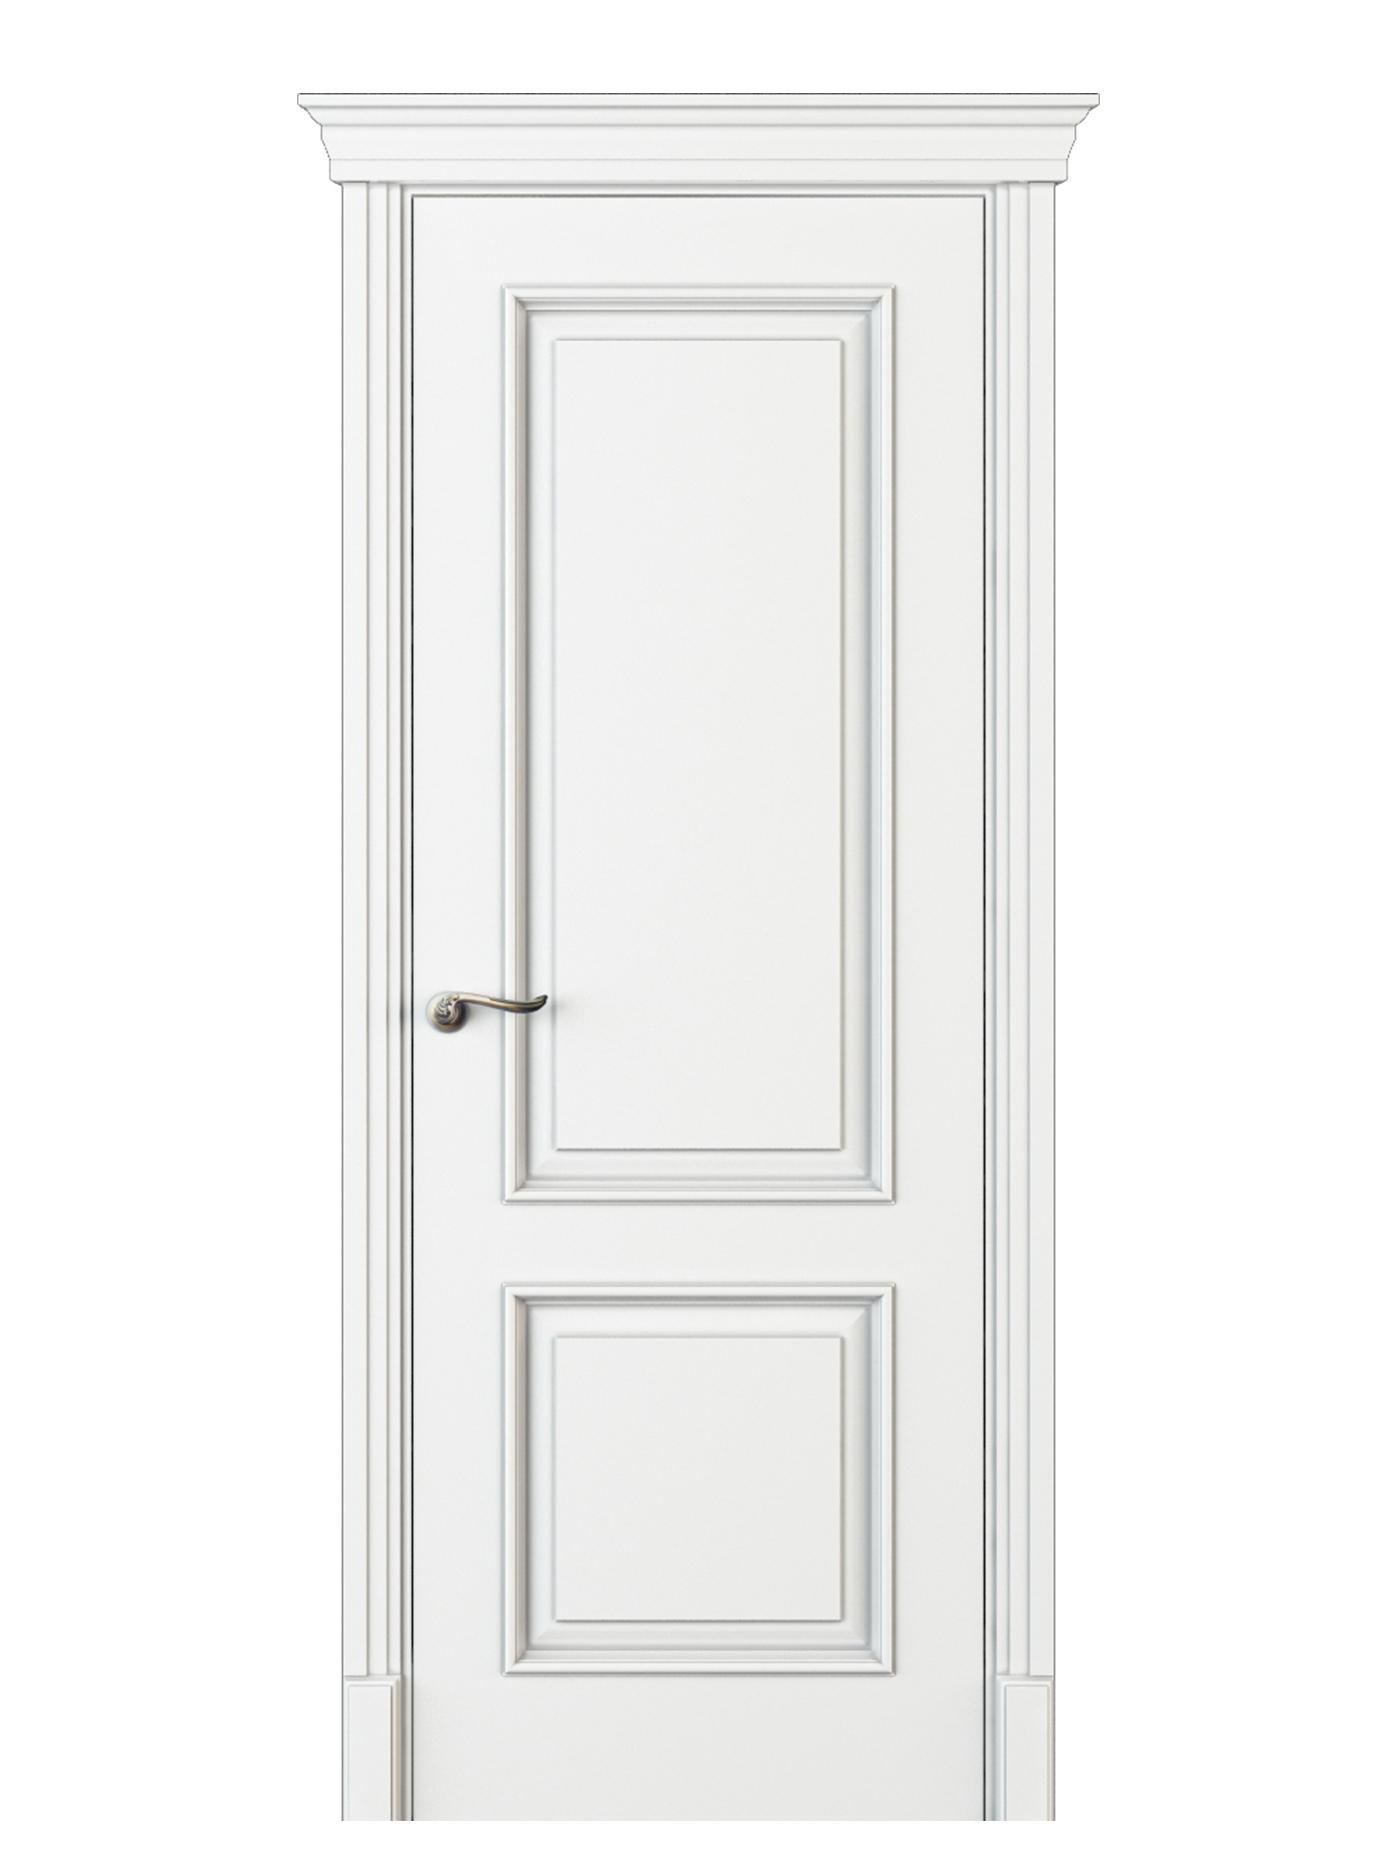 Image Madia Interior Door Italian Enamel White 0